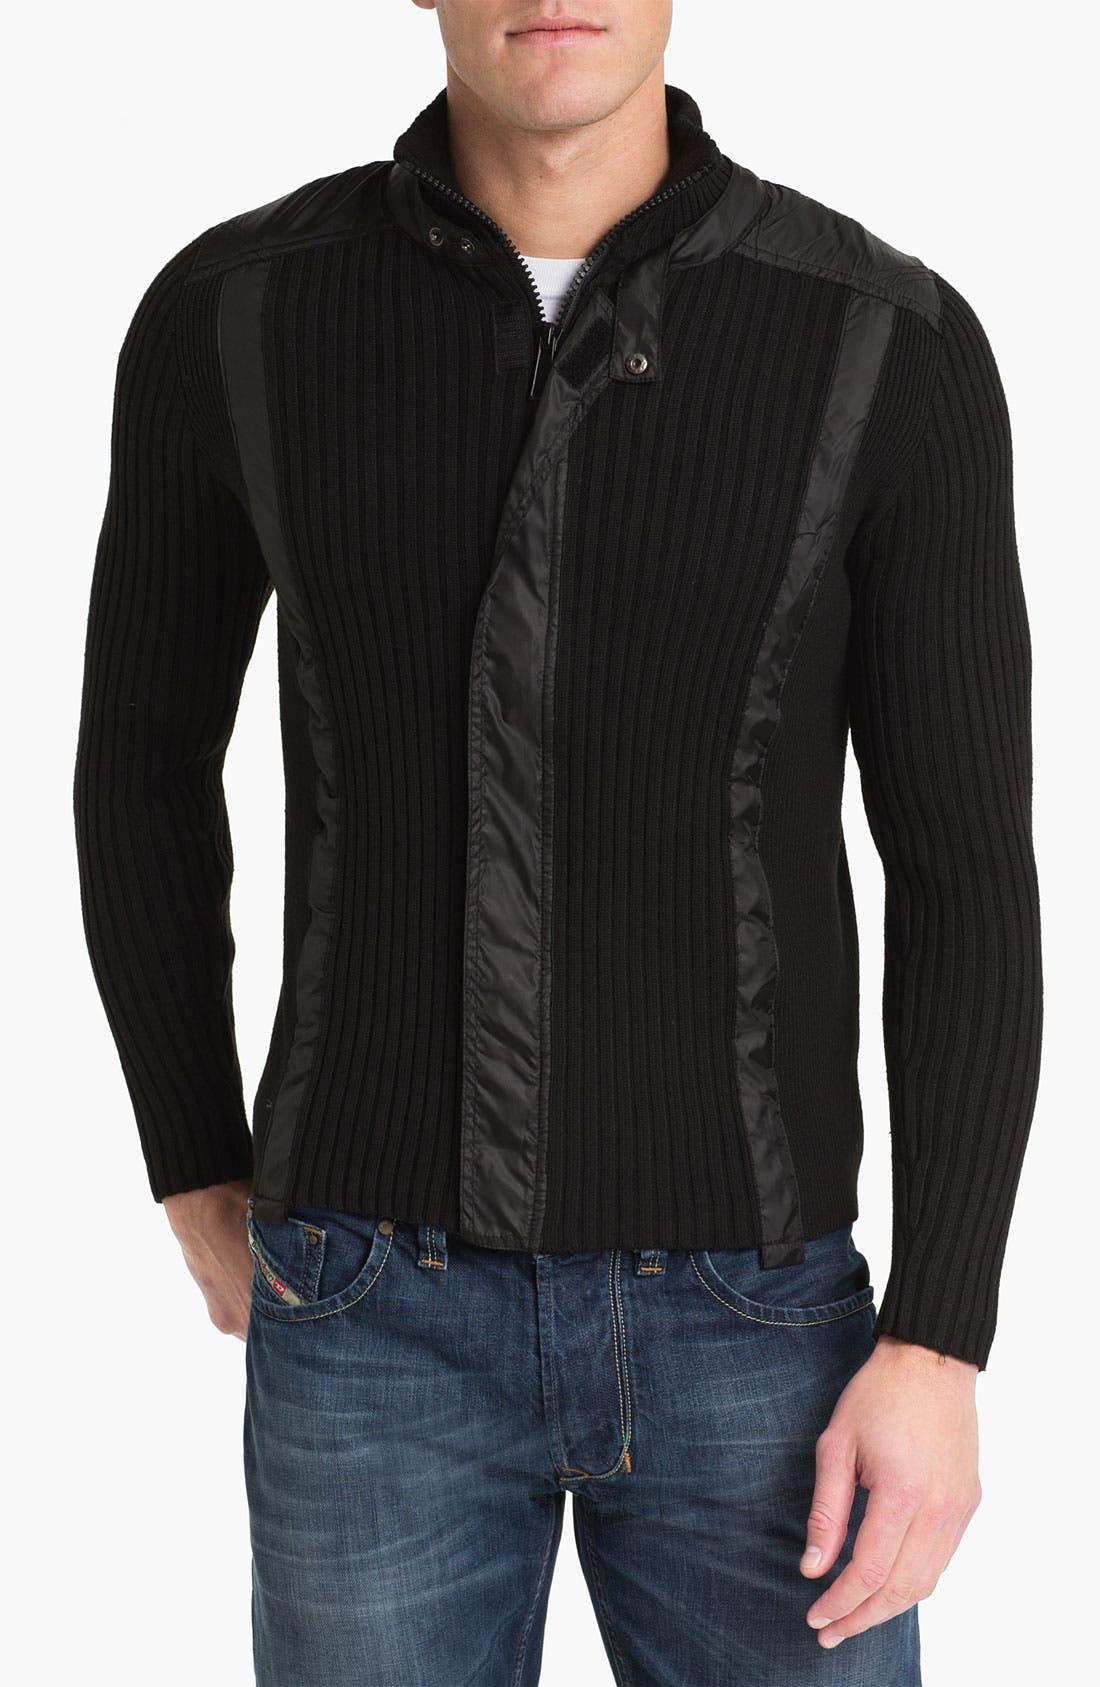 Main Image - Paul Black Zip Sweater